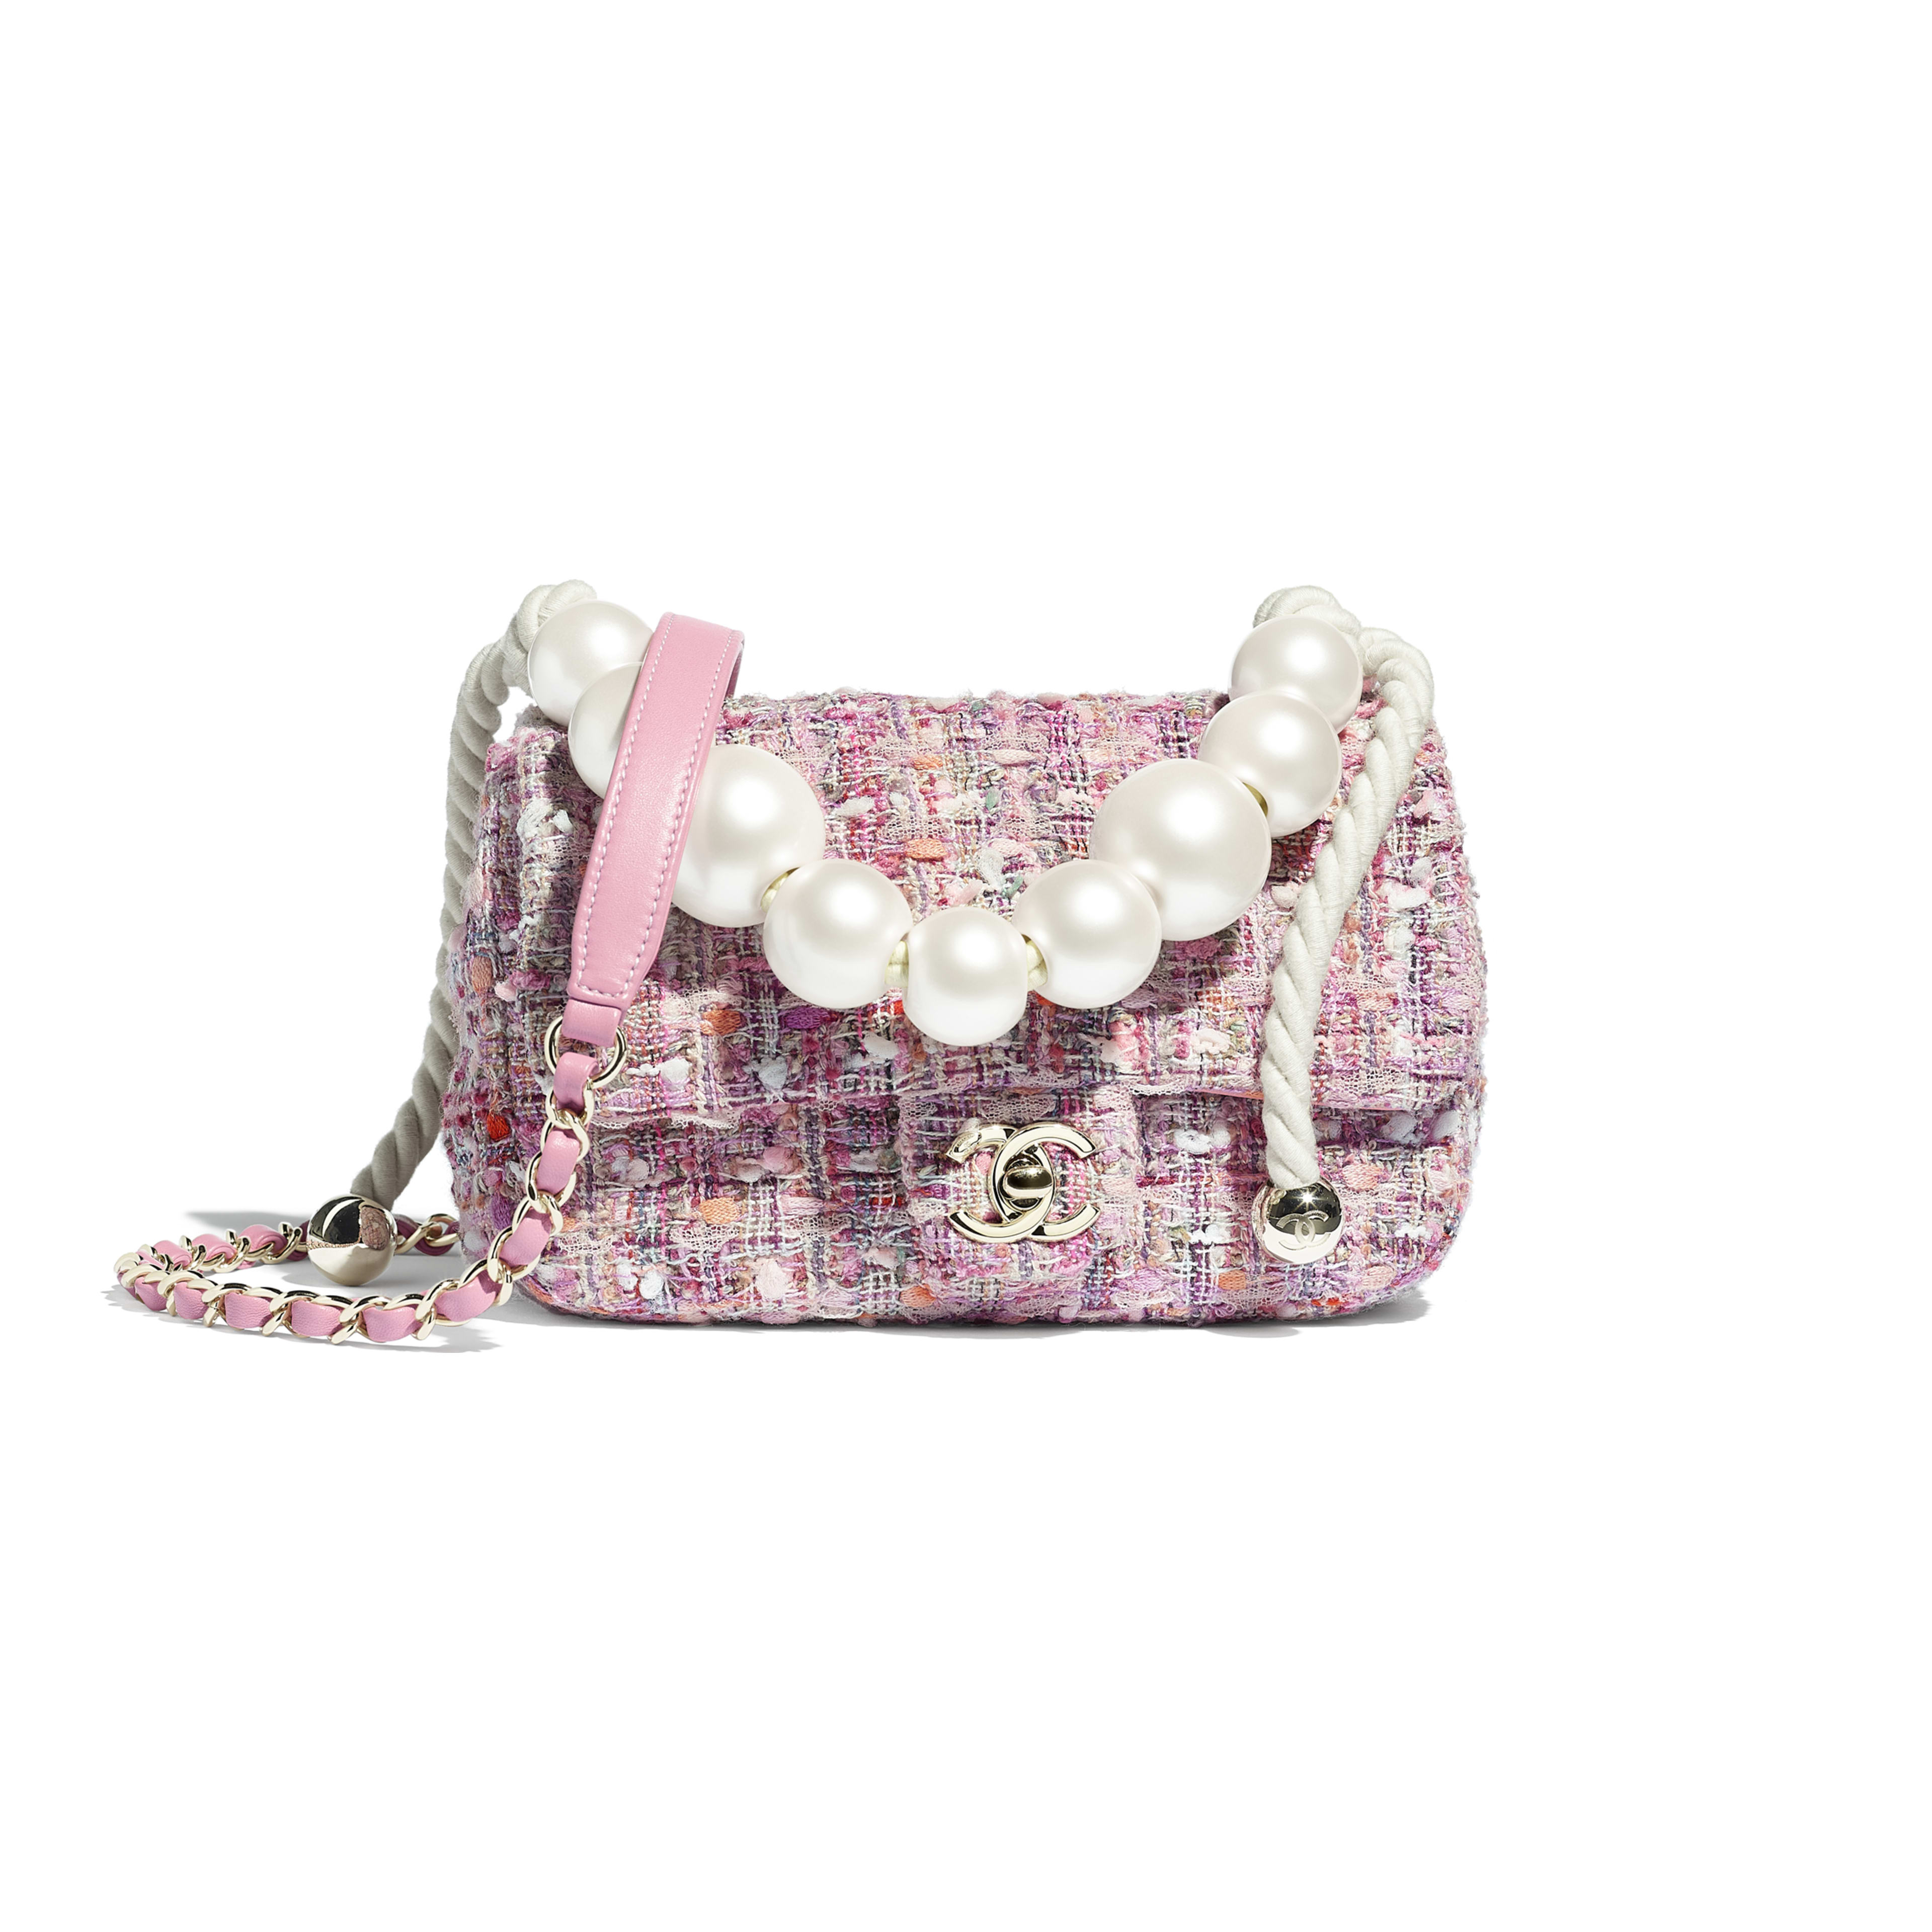 Tweed, Imitation Pearls & Gold-Tone Metal Pink, Beige, Orange & Ecru Flap Bag | CHANEL